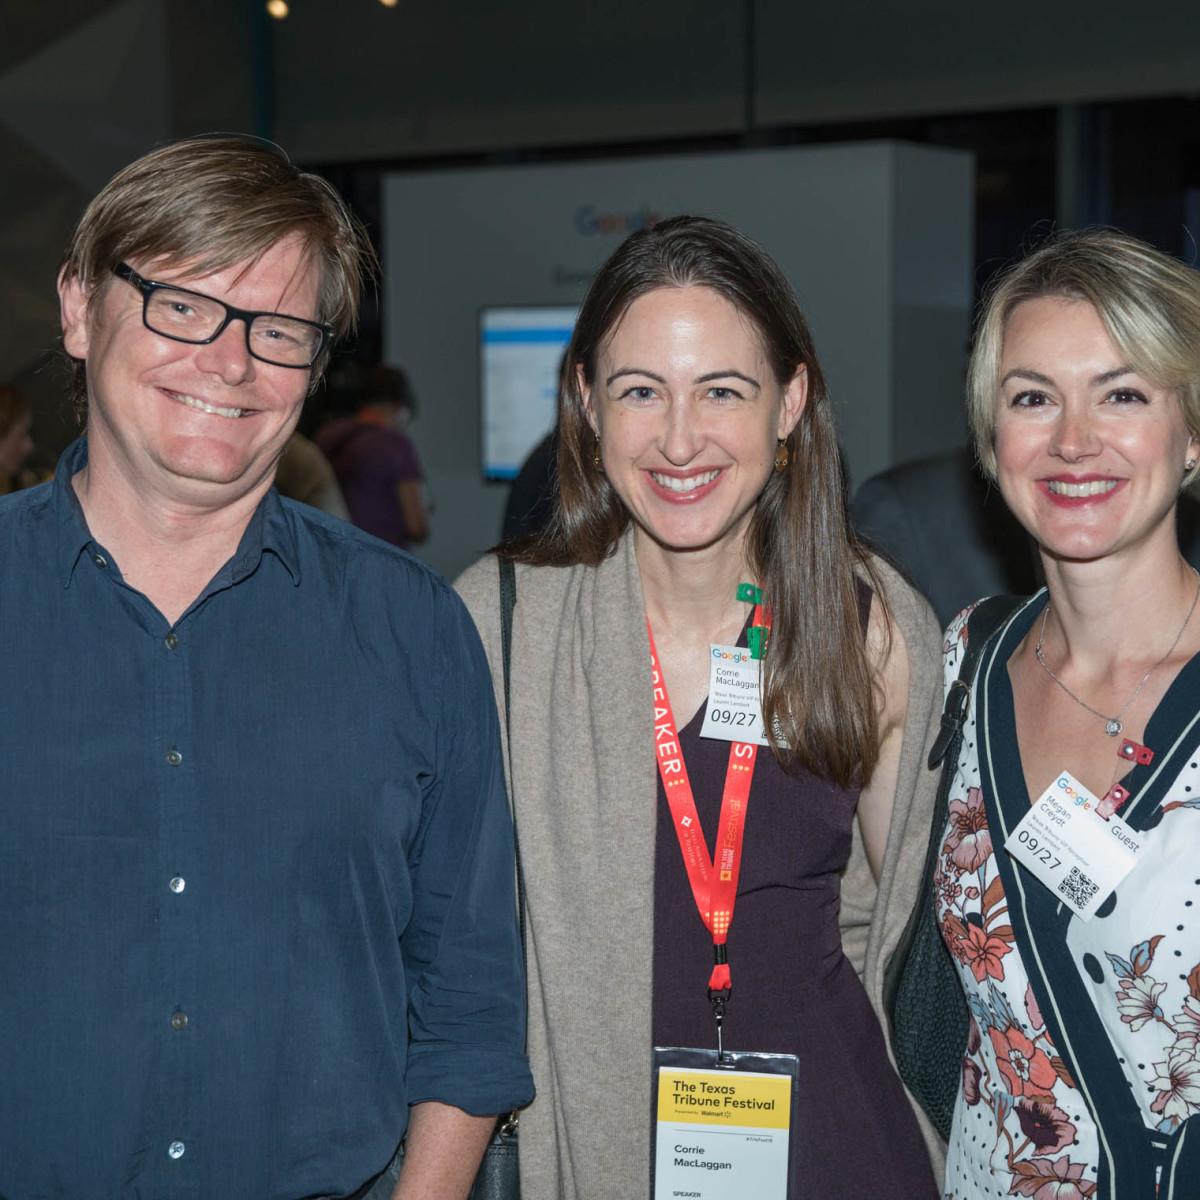 Texas Tribune Festival 2018 VIP Party at Google Steve Scheibal Corrie MacLaggan Megan Creydt